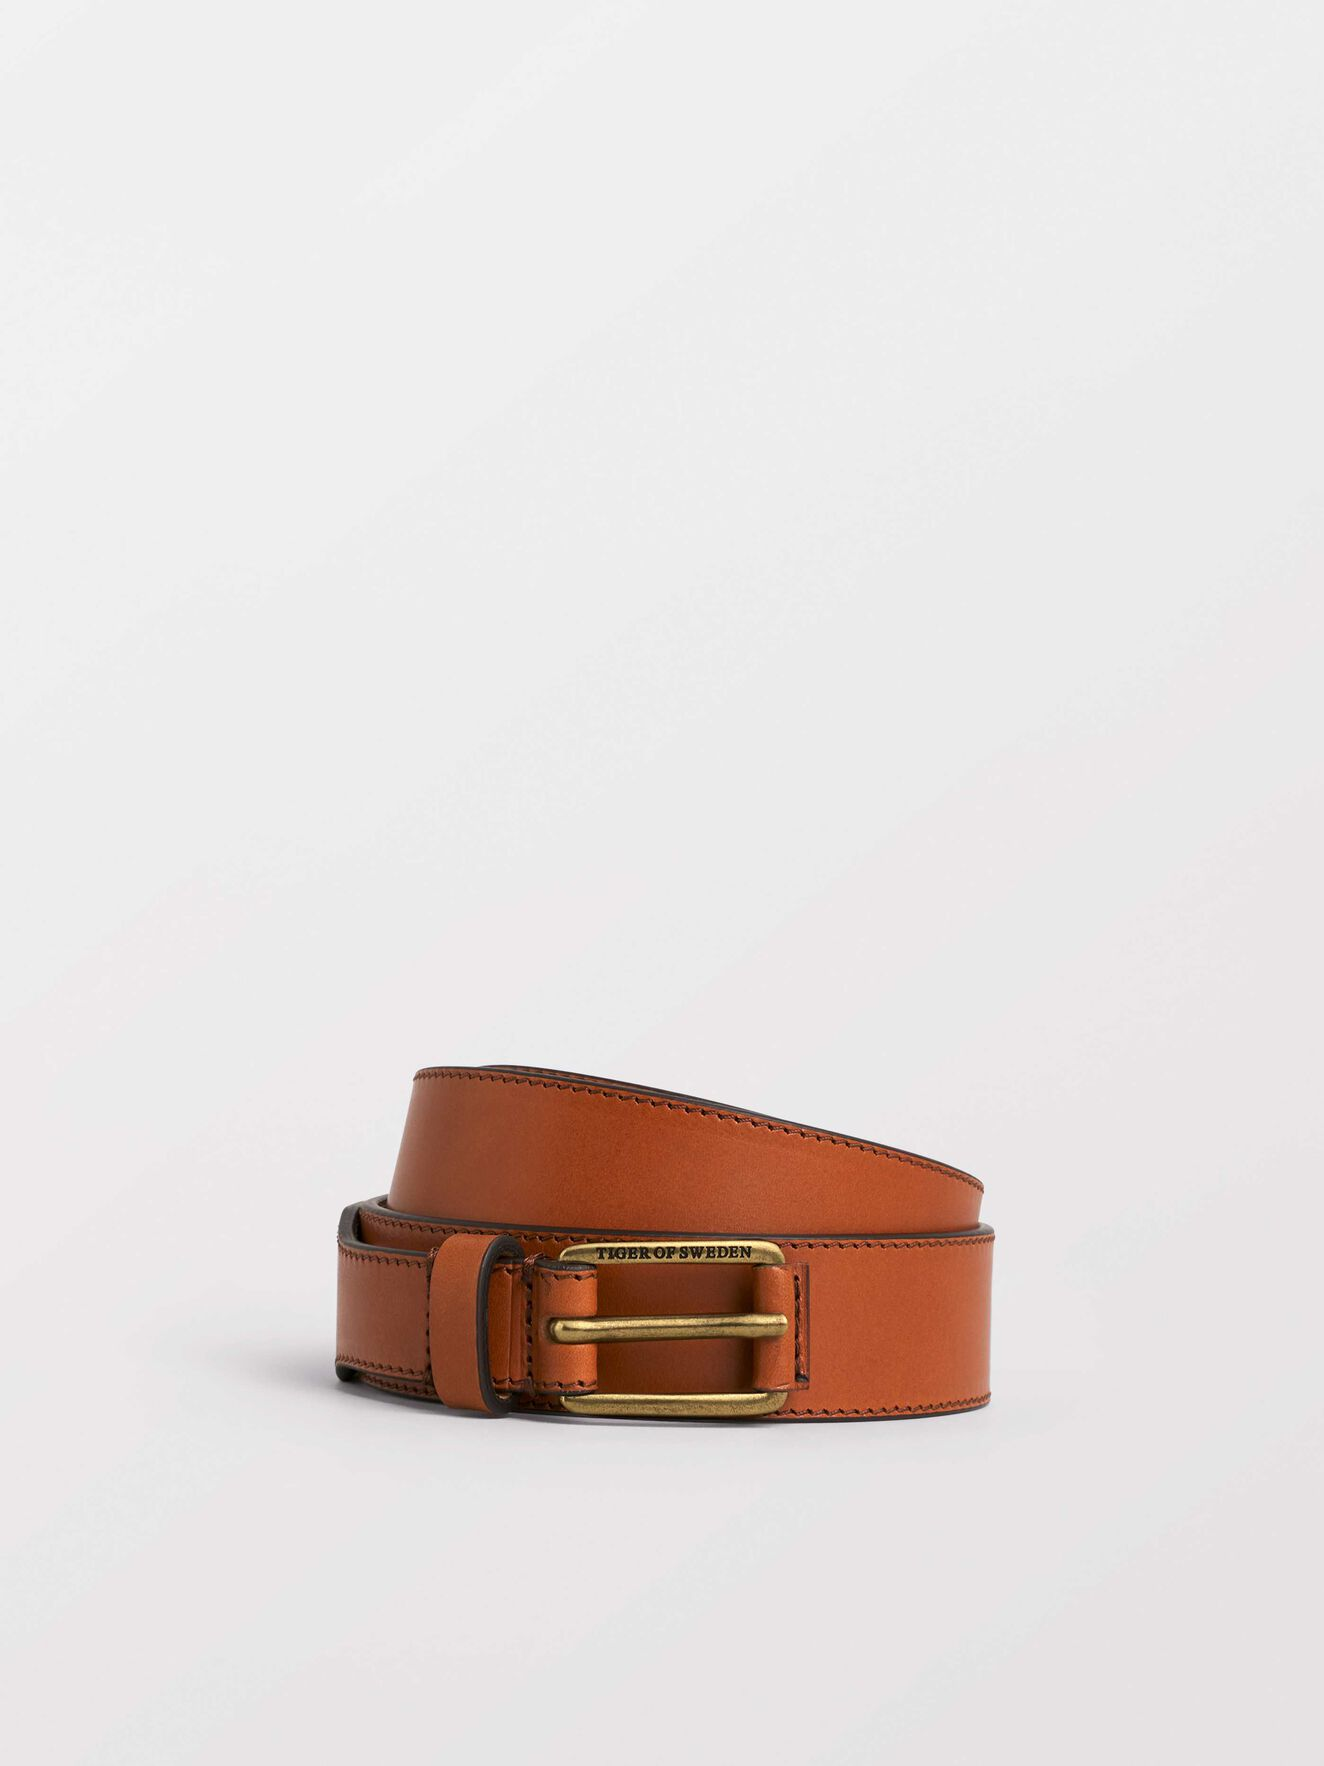 Erythro Belt in Cognac from Tiger of Sweden